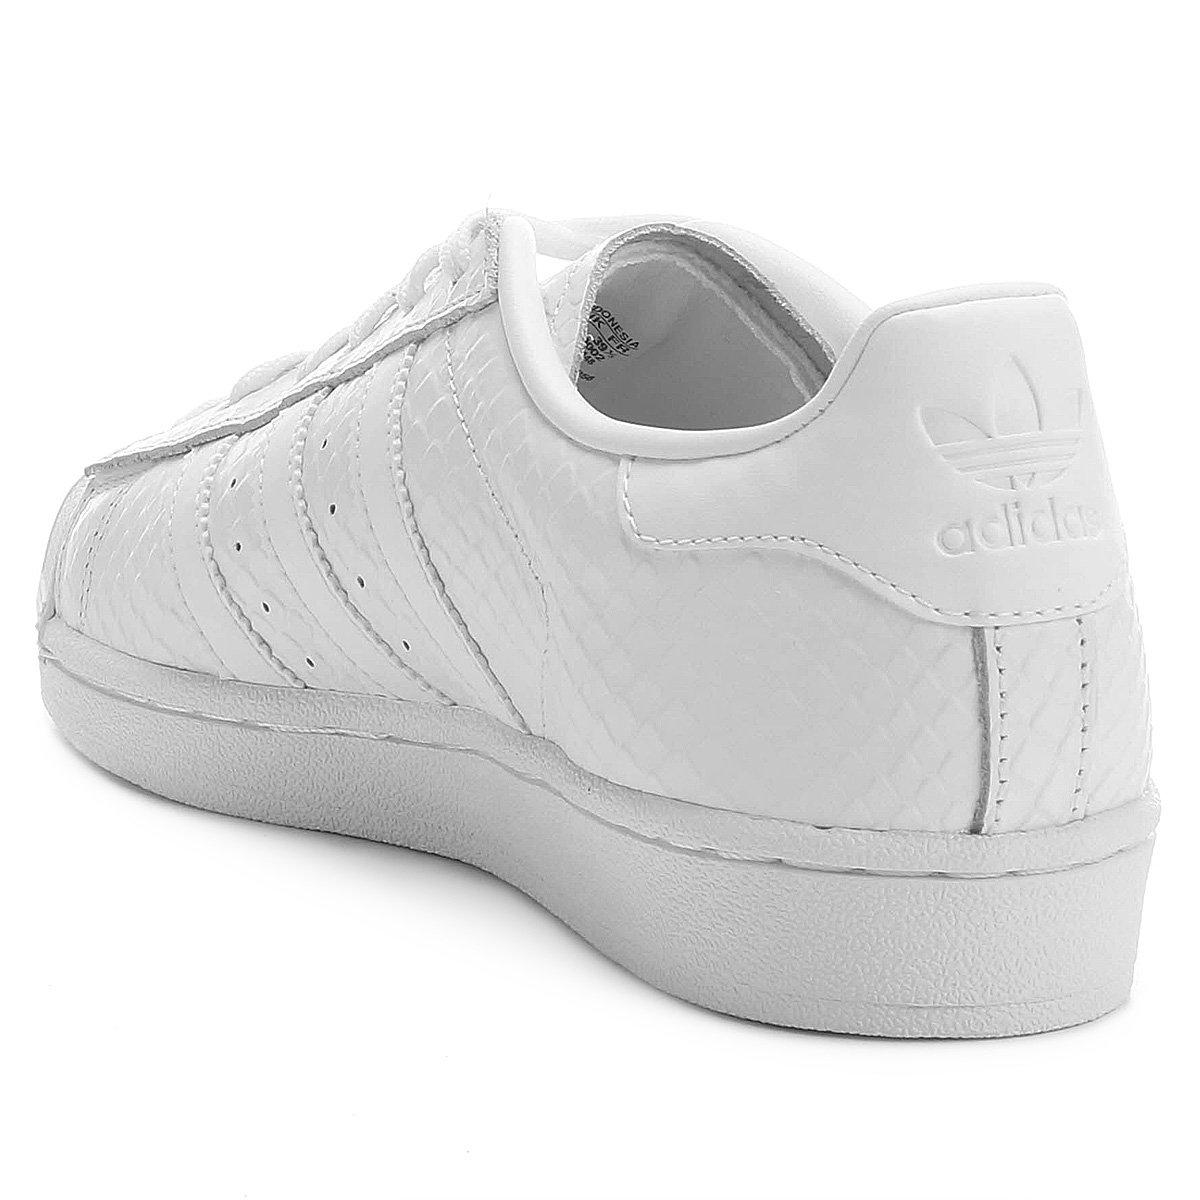 002c492beb ... Tênis Adidas Superstar W  Tênis Adidas Superstar W. Tênis Adidas  Superstar W - Branco+Preto